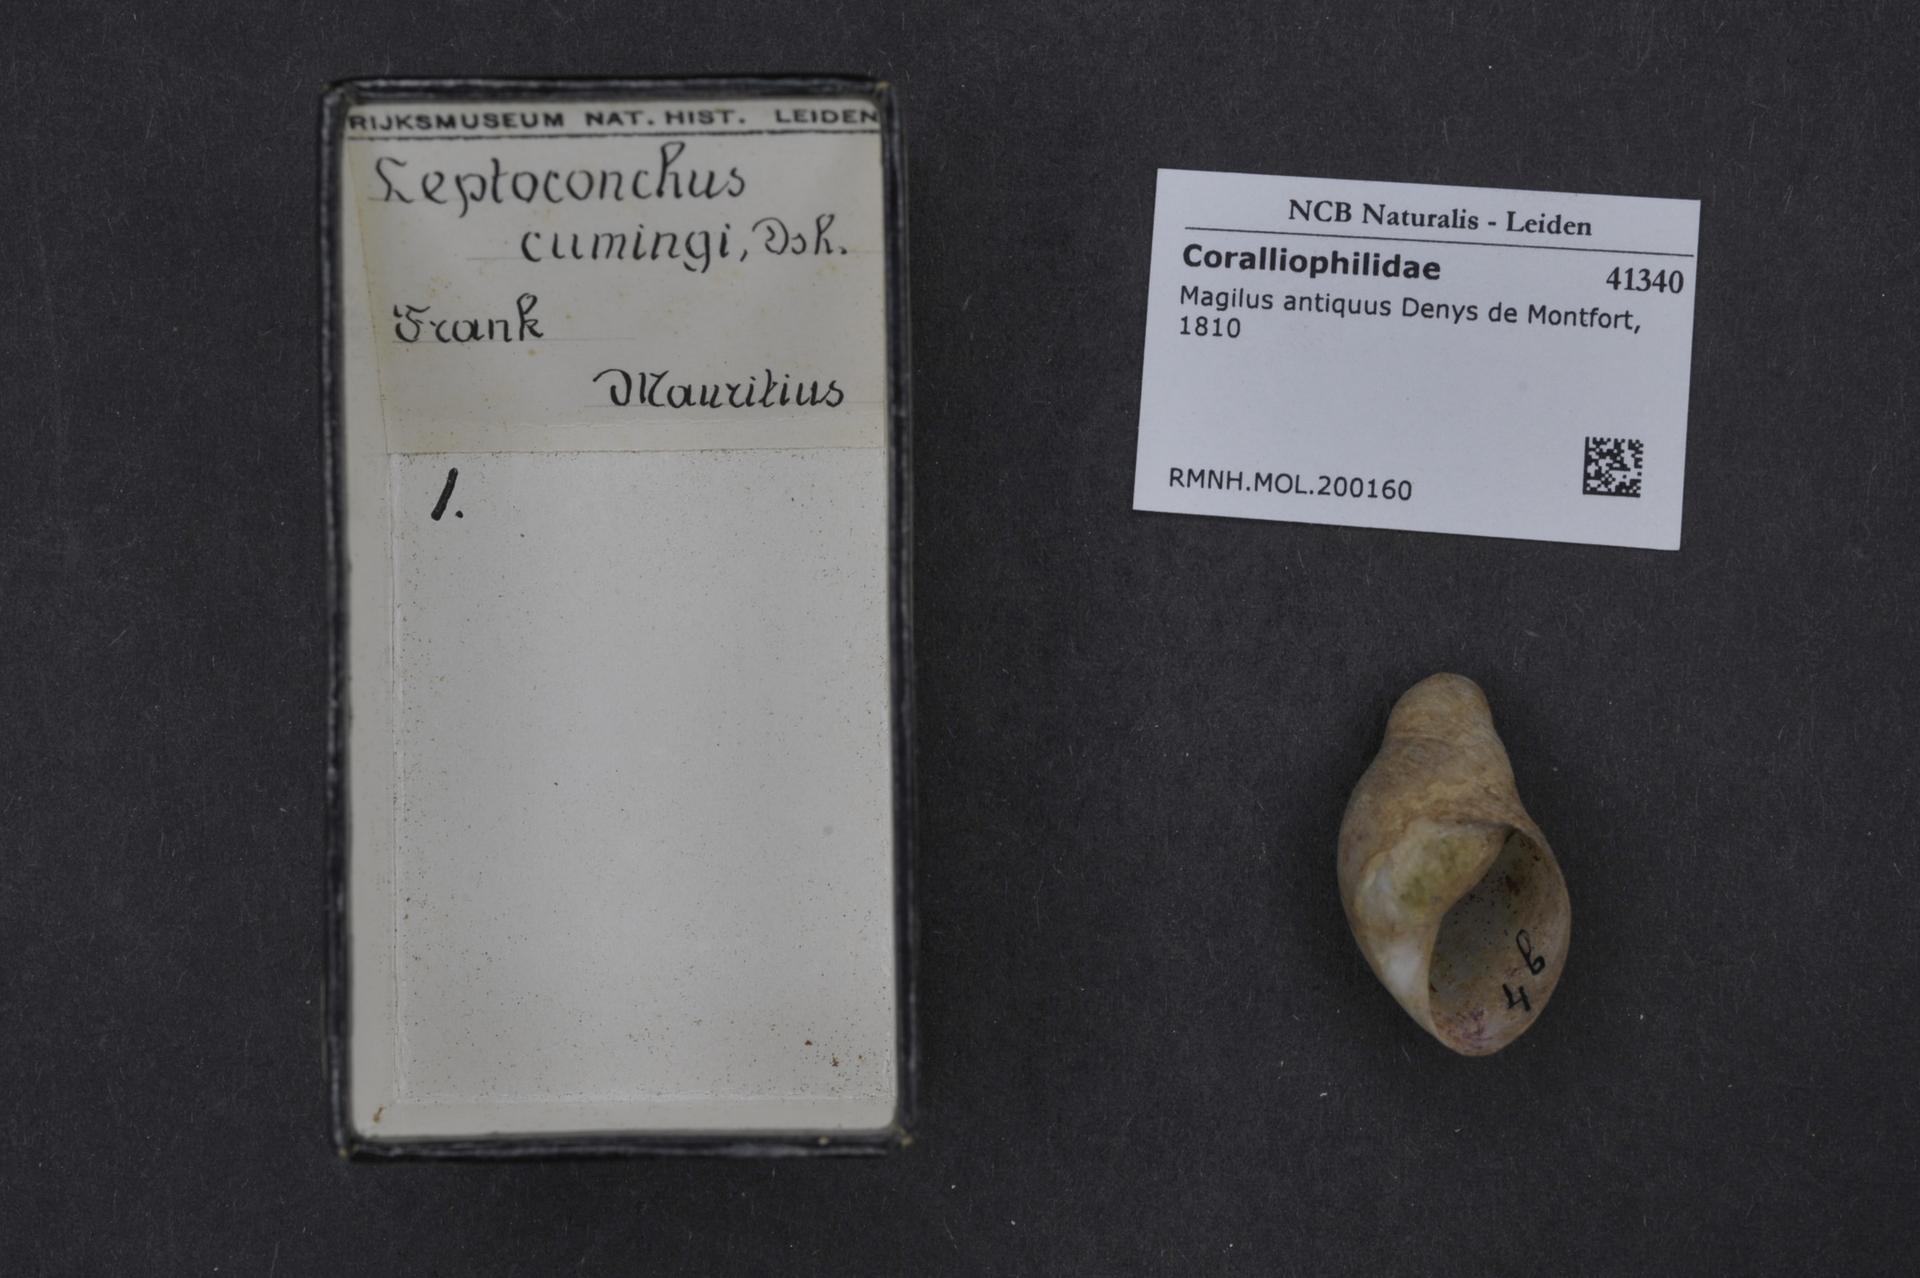 RMNH.MOL.200160 | Magilus antiquus Denys de Montfort, 1810